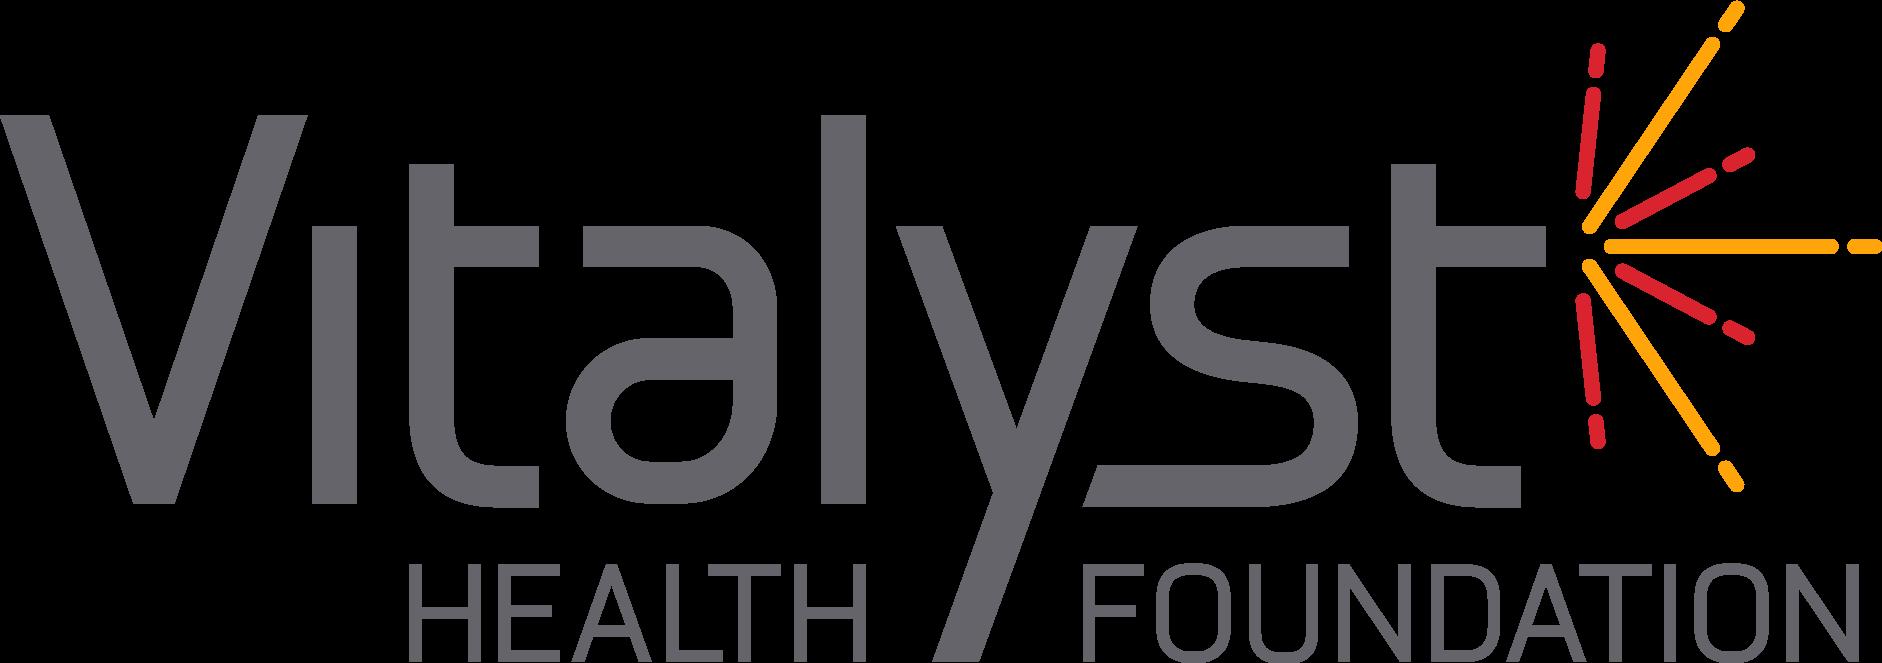 Vitalyst_Logo.png